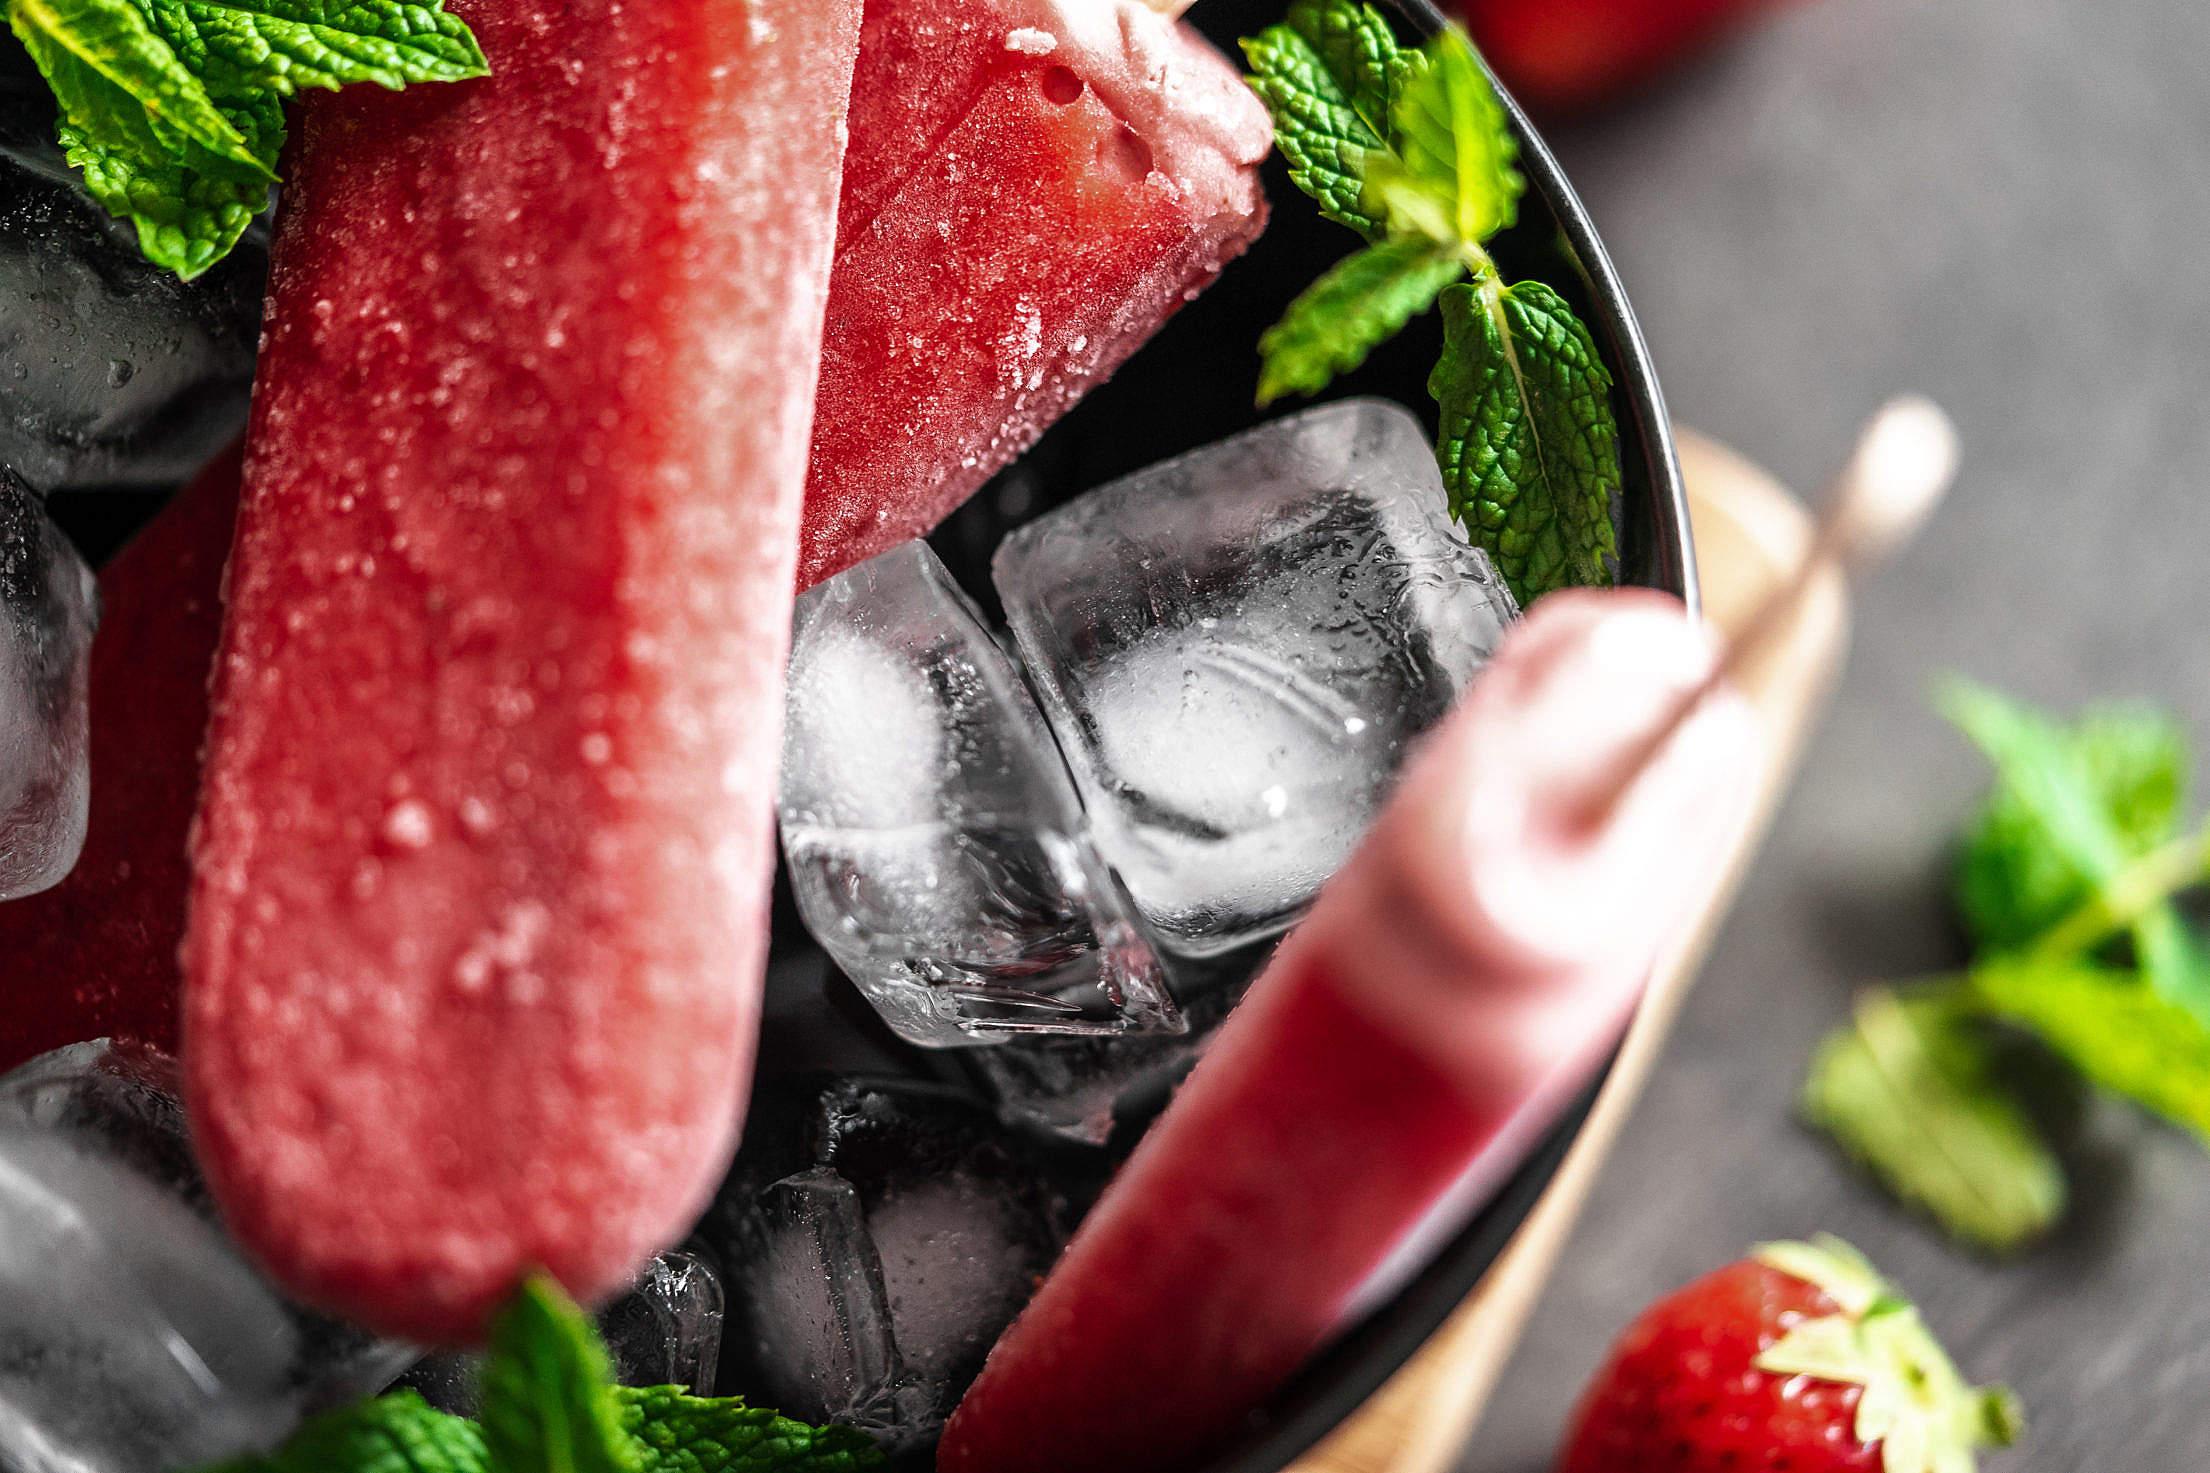 Strawberry Ice Lollies with Ice Free Stock Photo